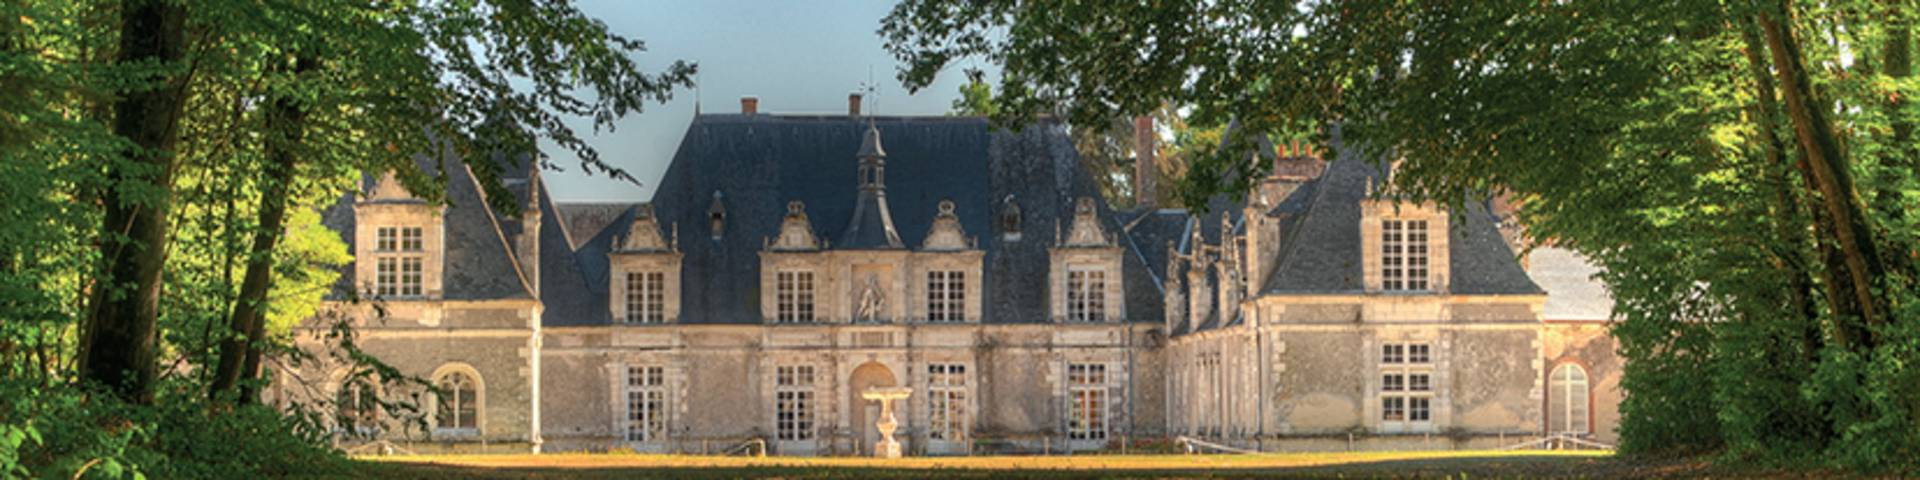 Château de Villesavin © Léonard de Serres